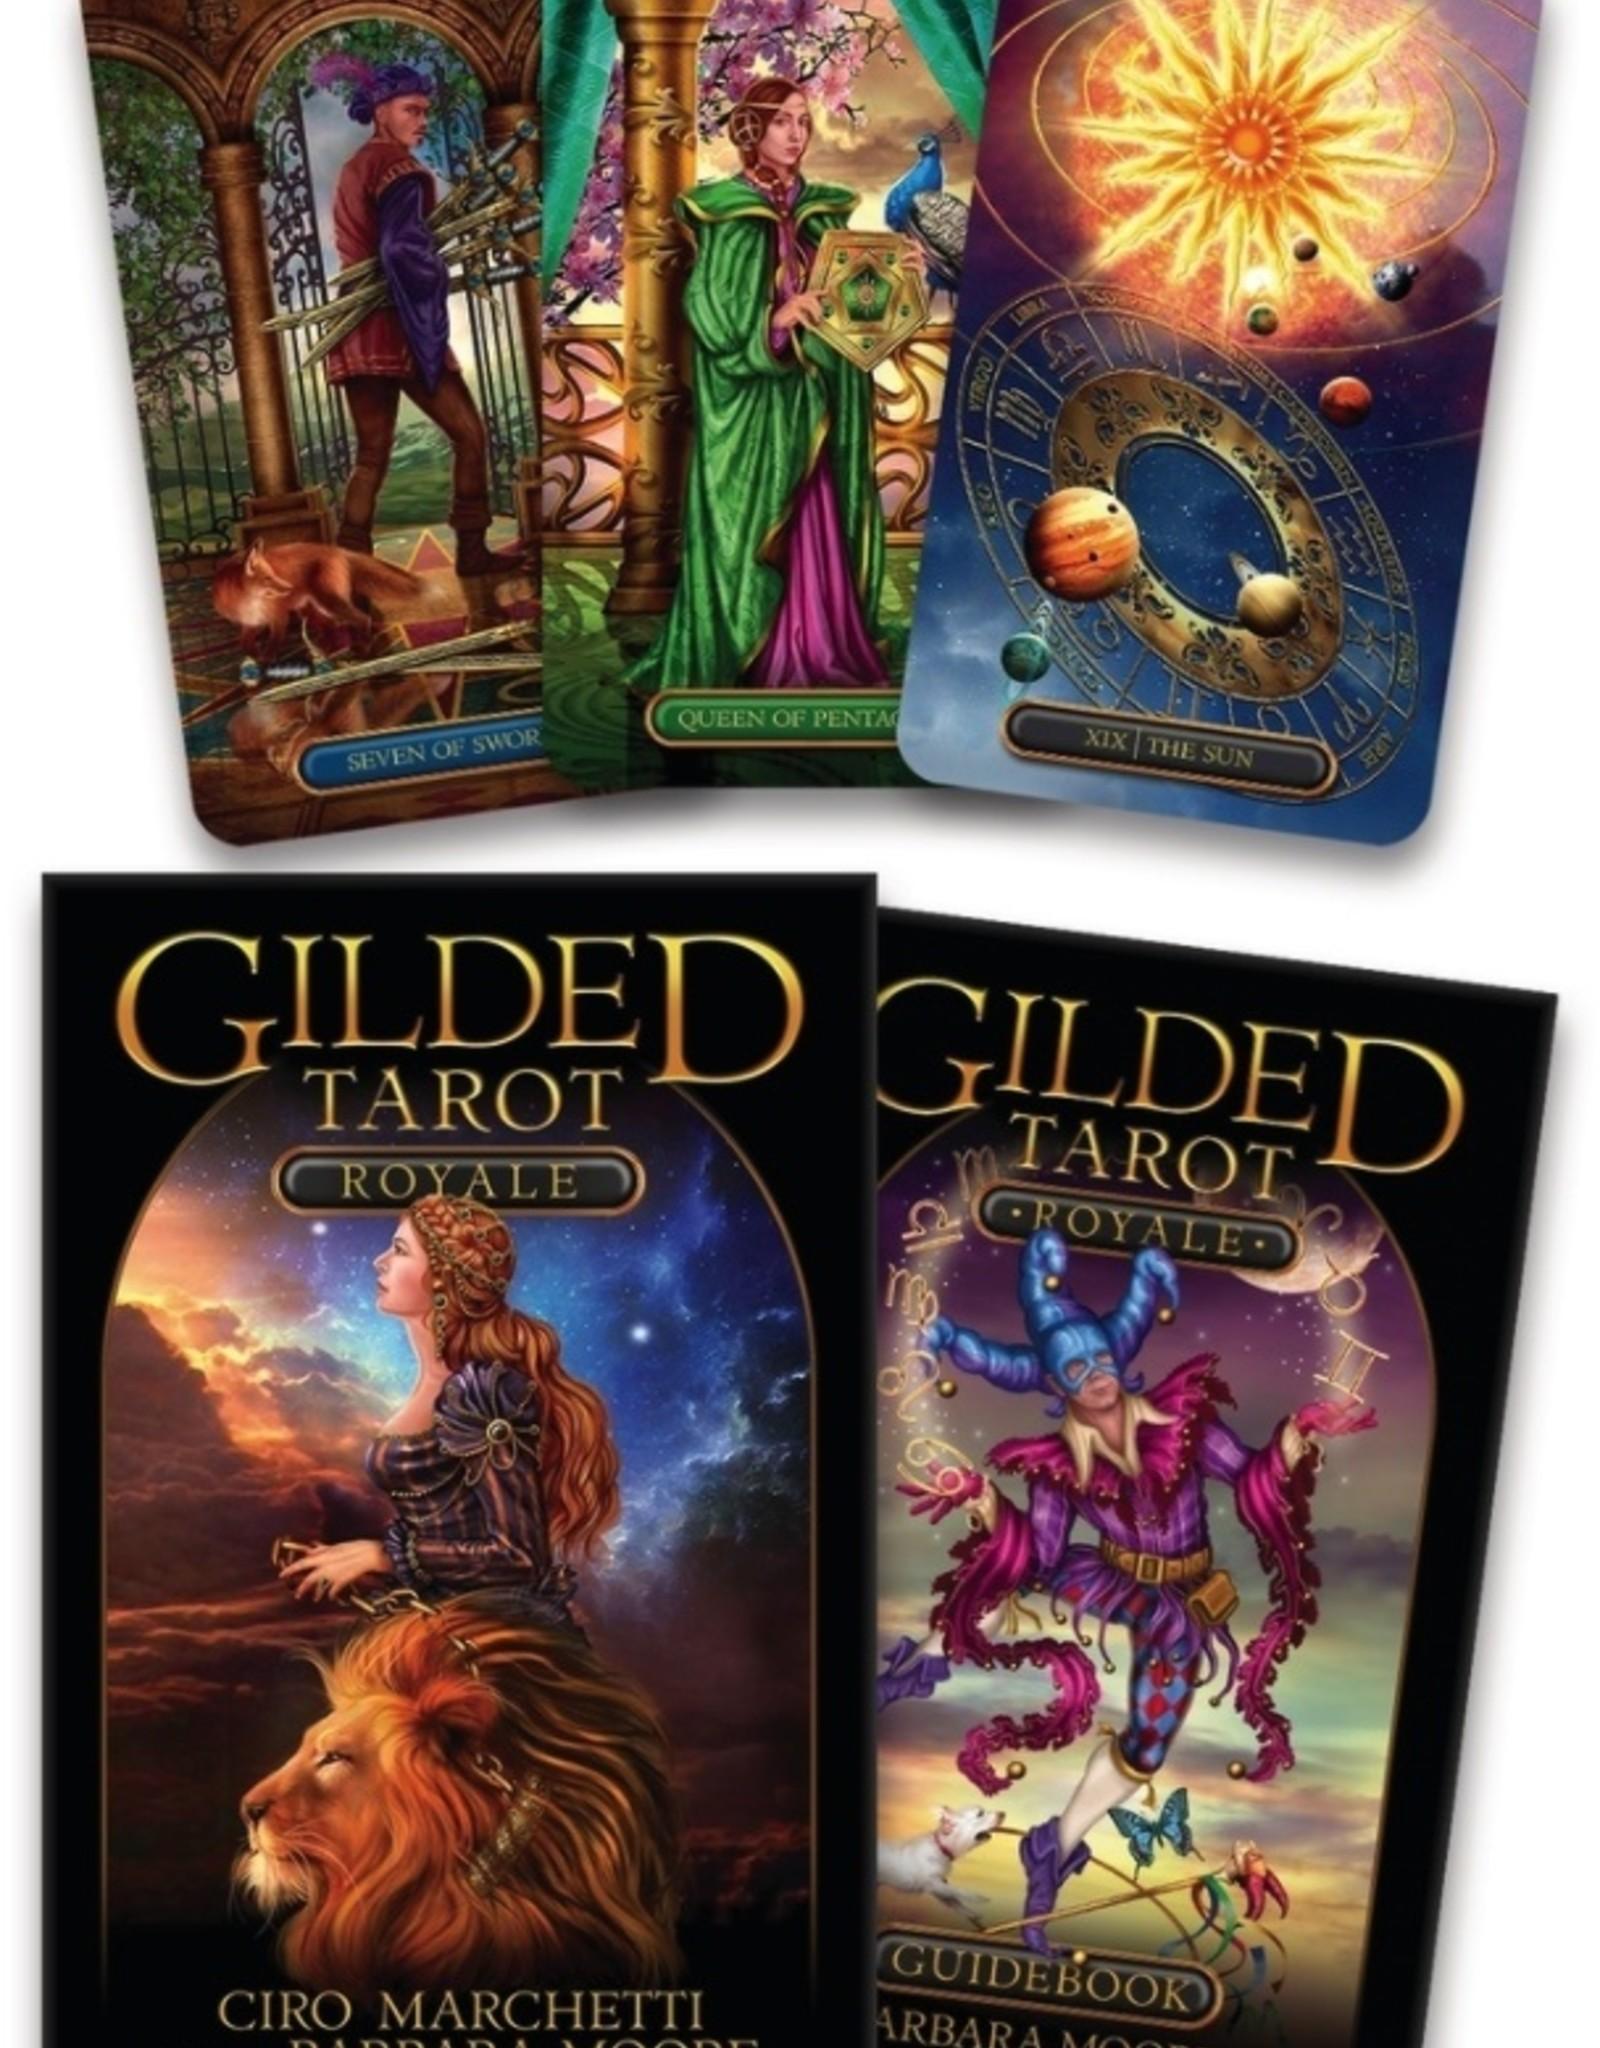 Llewelyn Gilded Tarot Royale